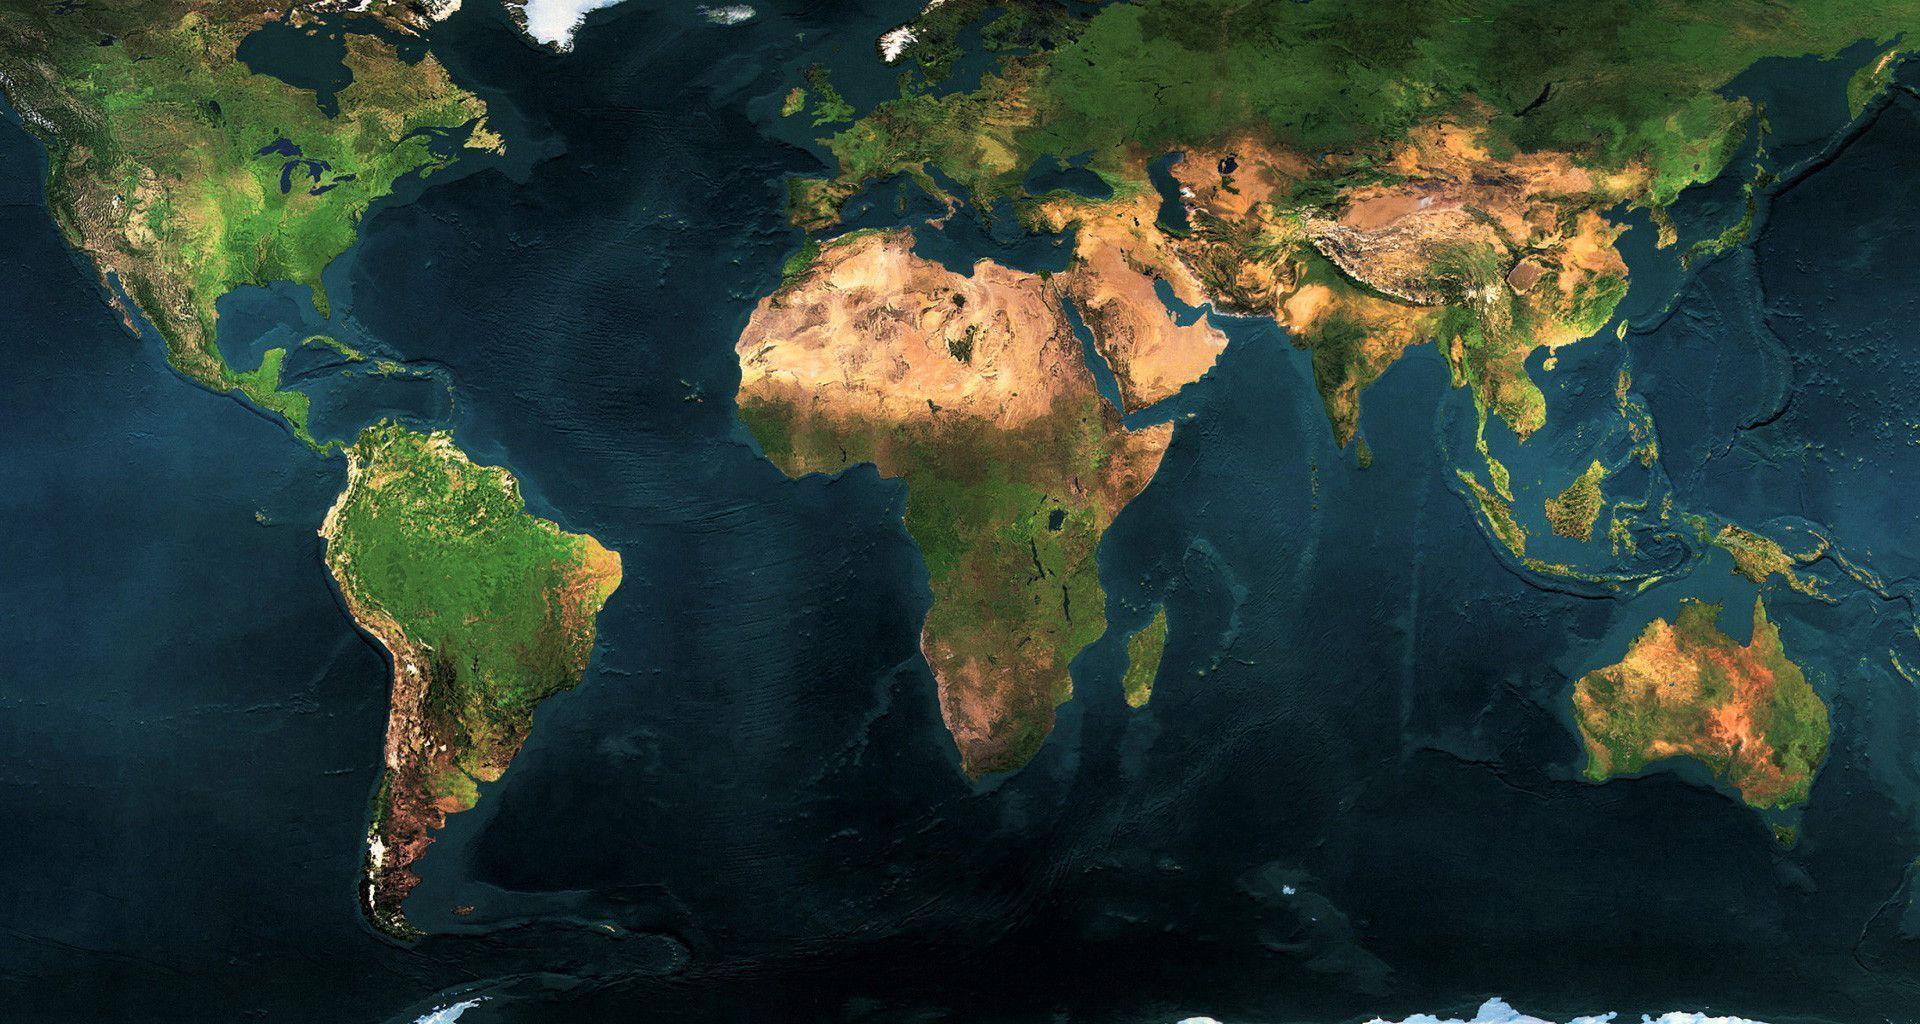 World Map Wallpapers High Resolution 1920x1024